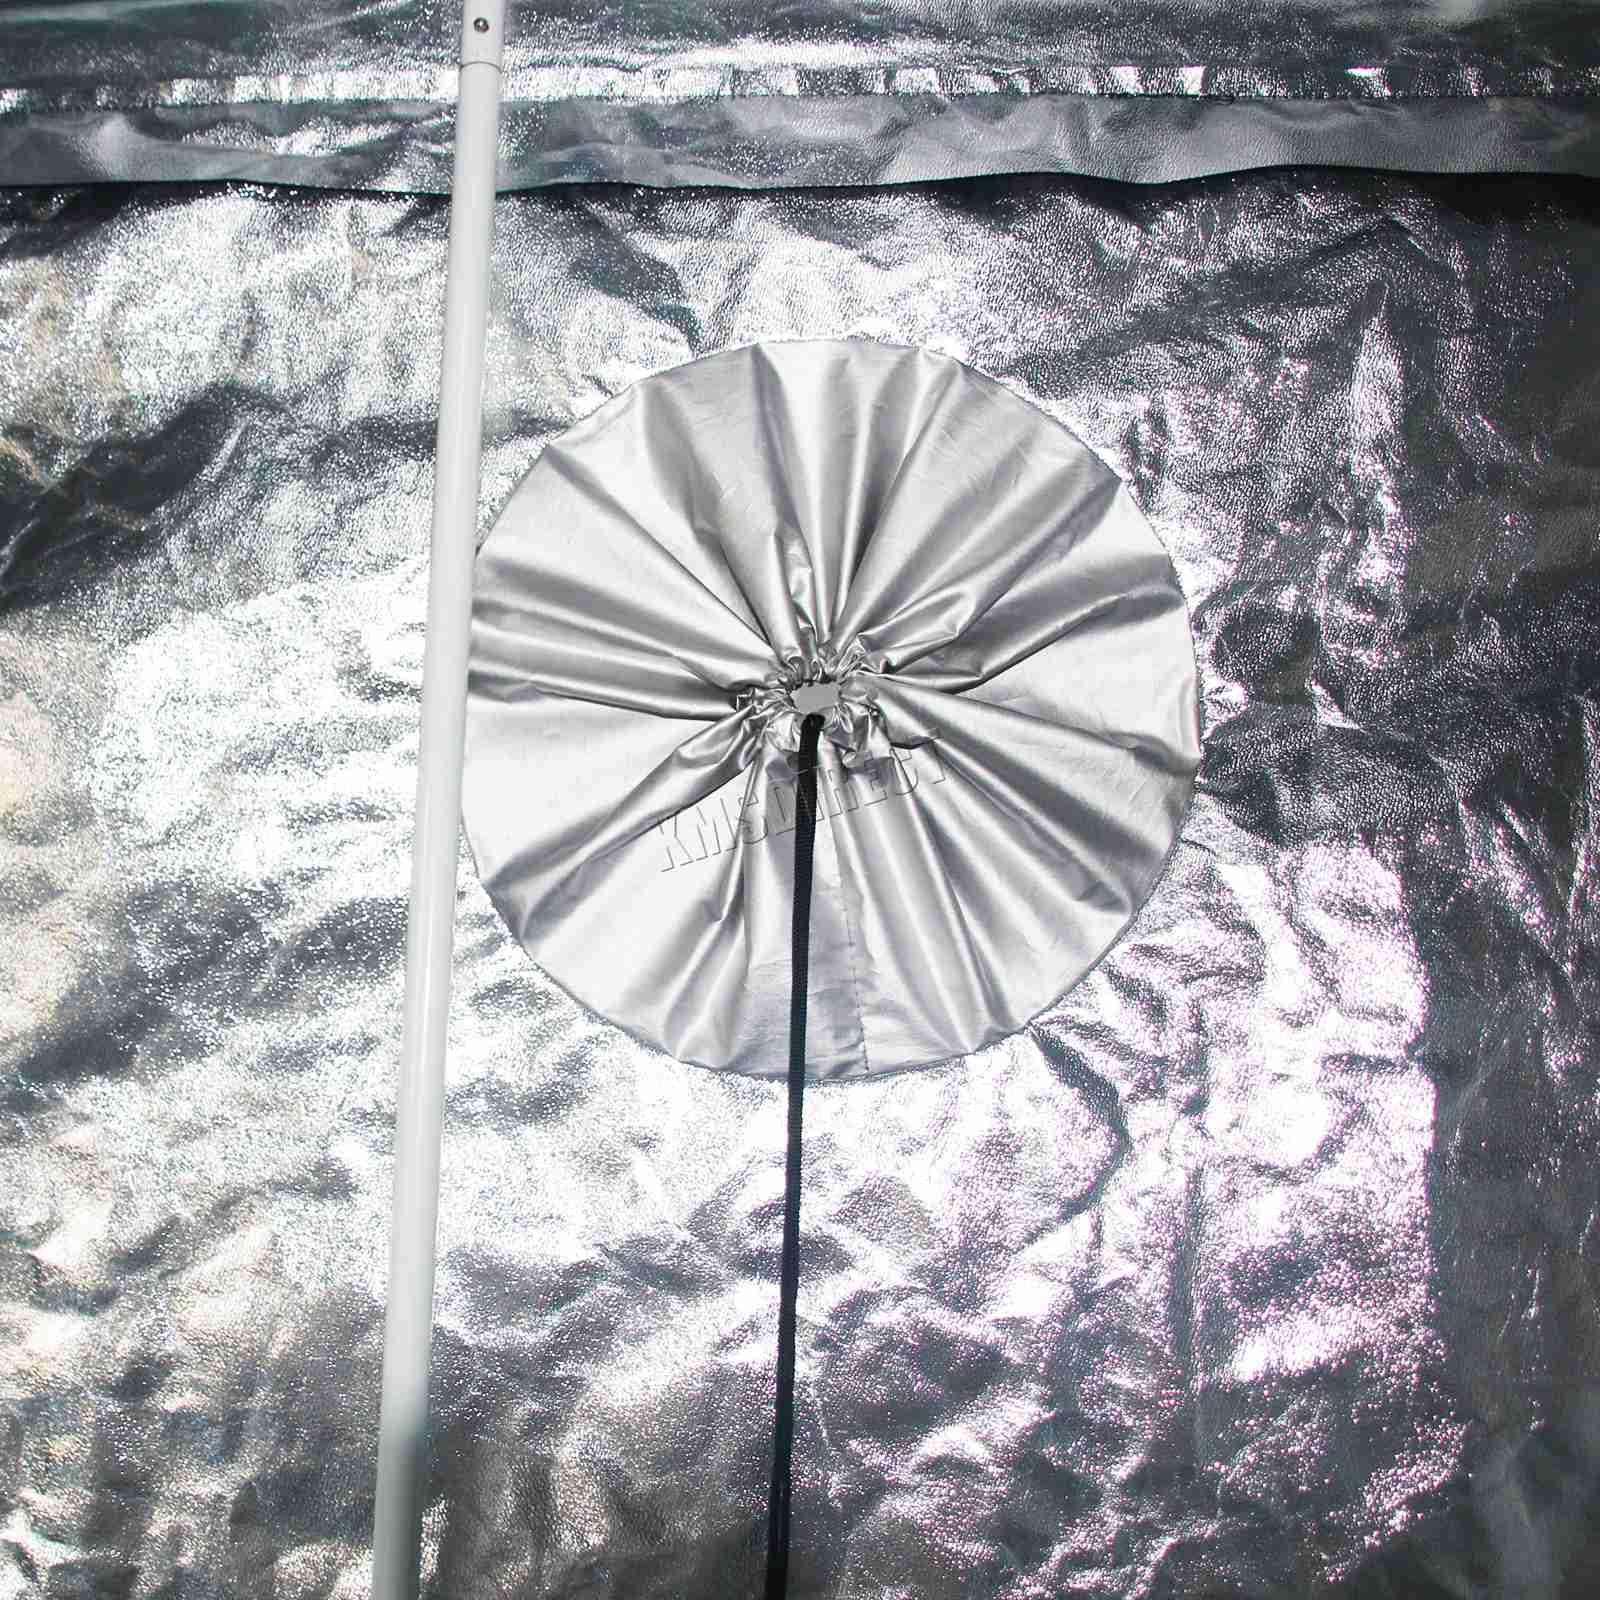 Indoor-Portable-Grow-Tent-Box-Silver-Mylar-Hydroponics-Bud-Green-Room-New-Design miniatuur 26